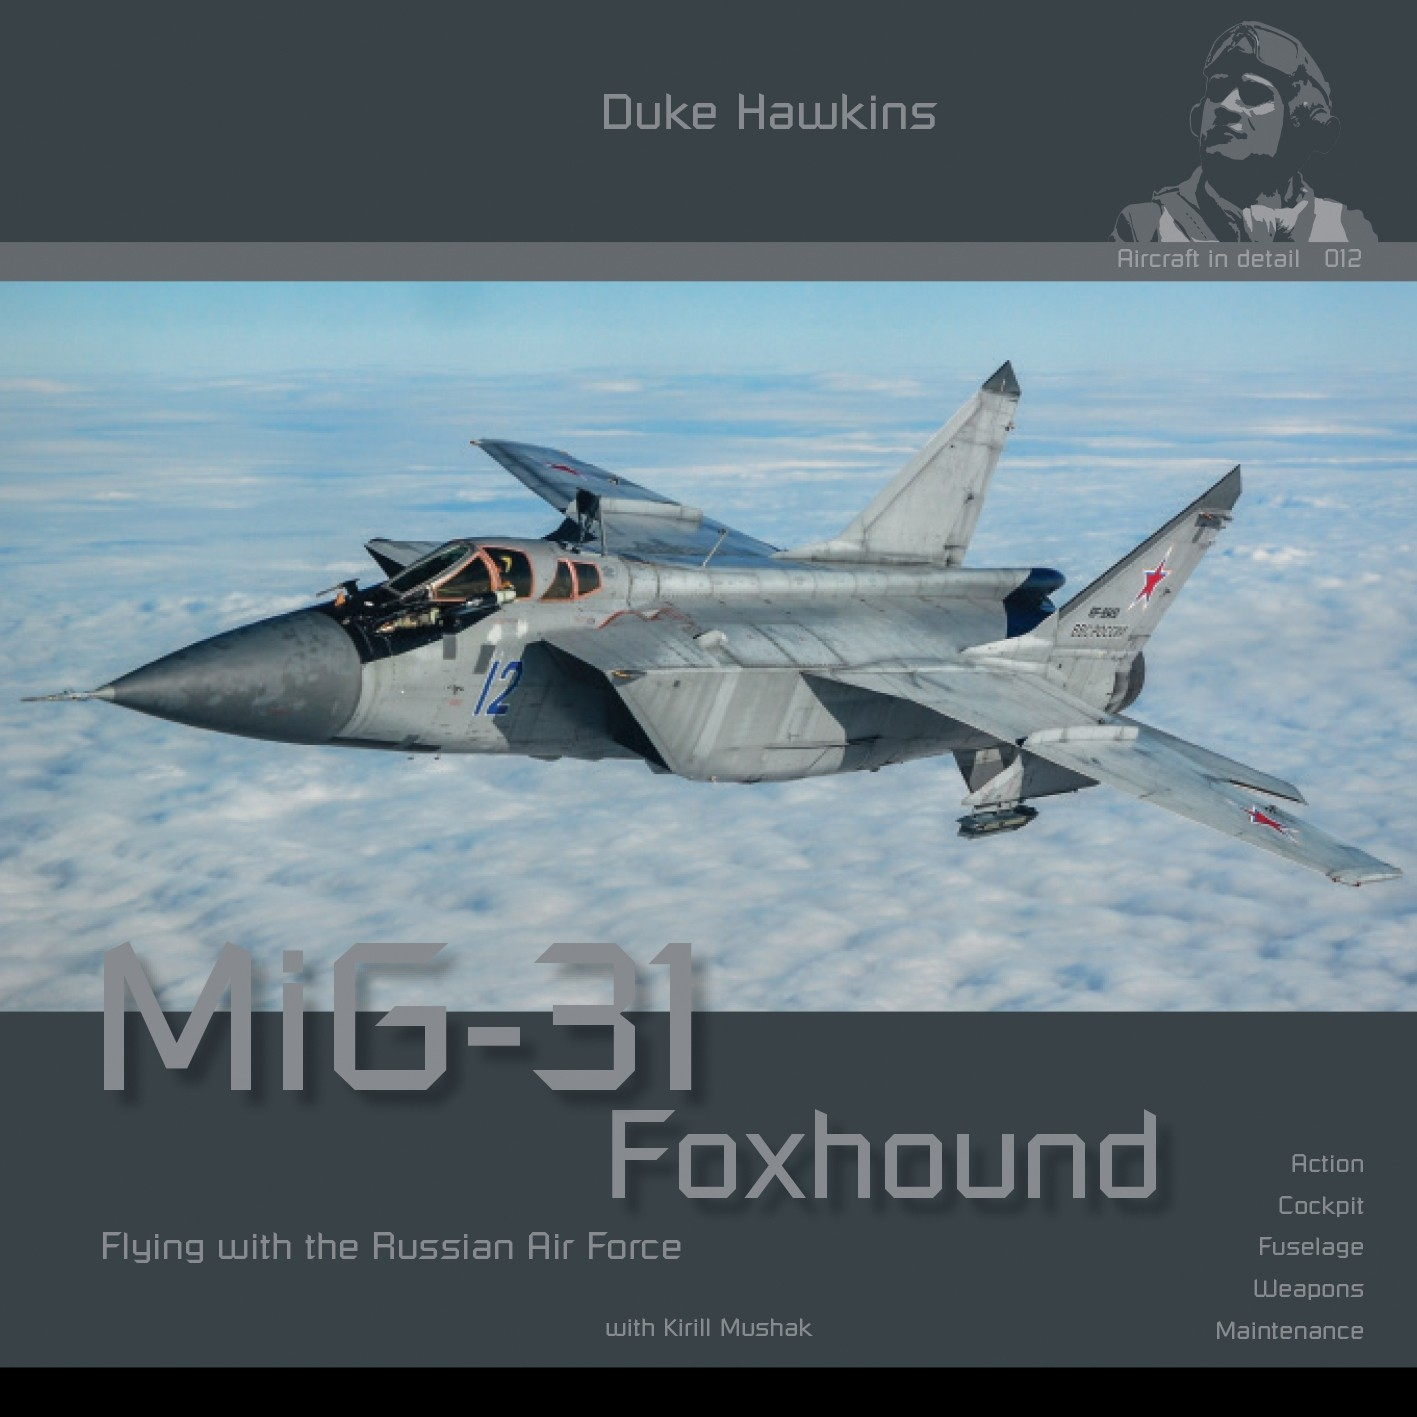 Duke Hawkins: Mikoyan MiG-31 Foxhound